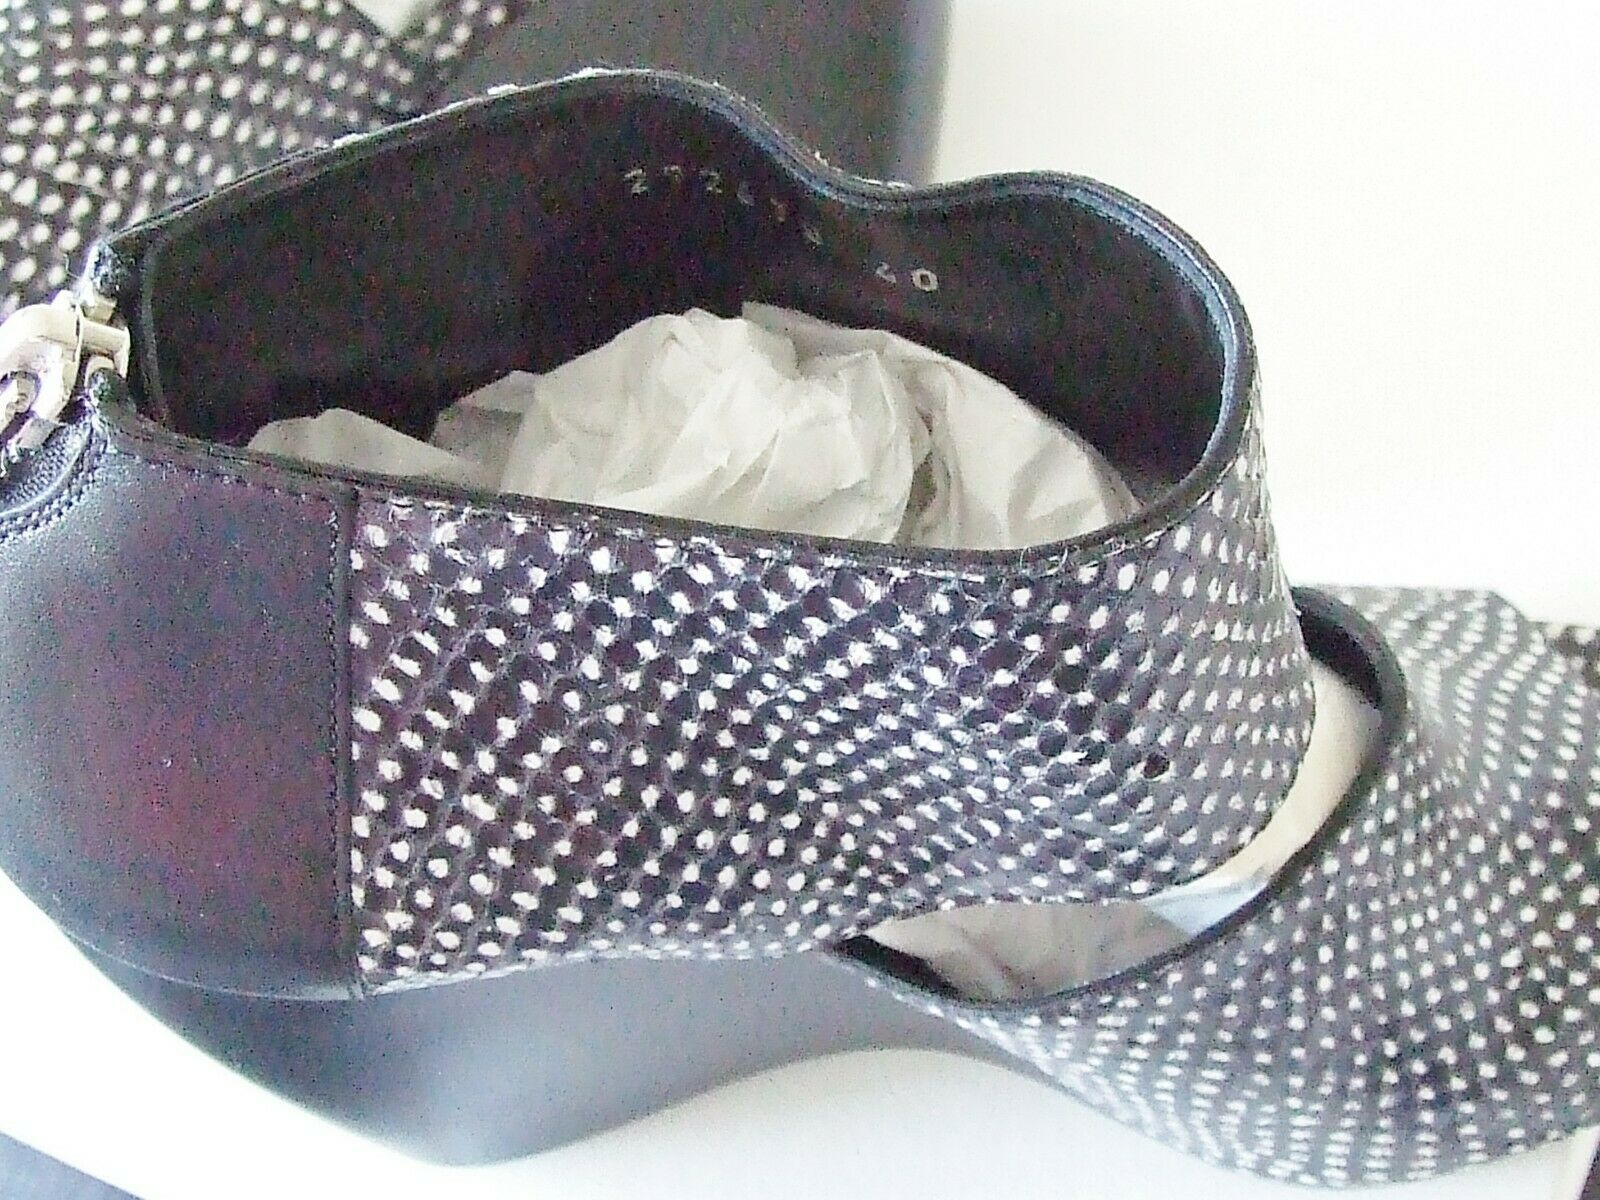 Balenciaga Leather and Snake Skin Wedge Heels Sz Sz Heels 40 IT 9 US  1065 New In Box 327057